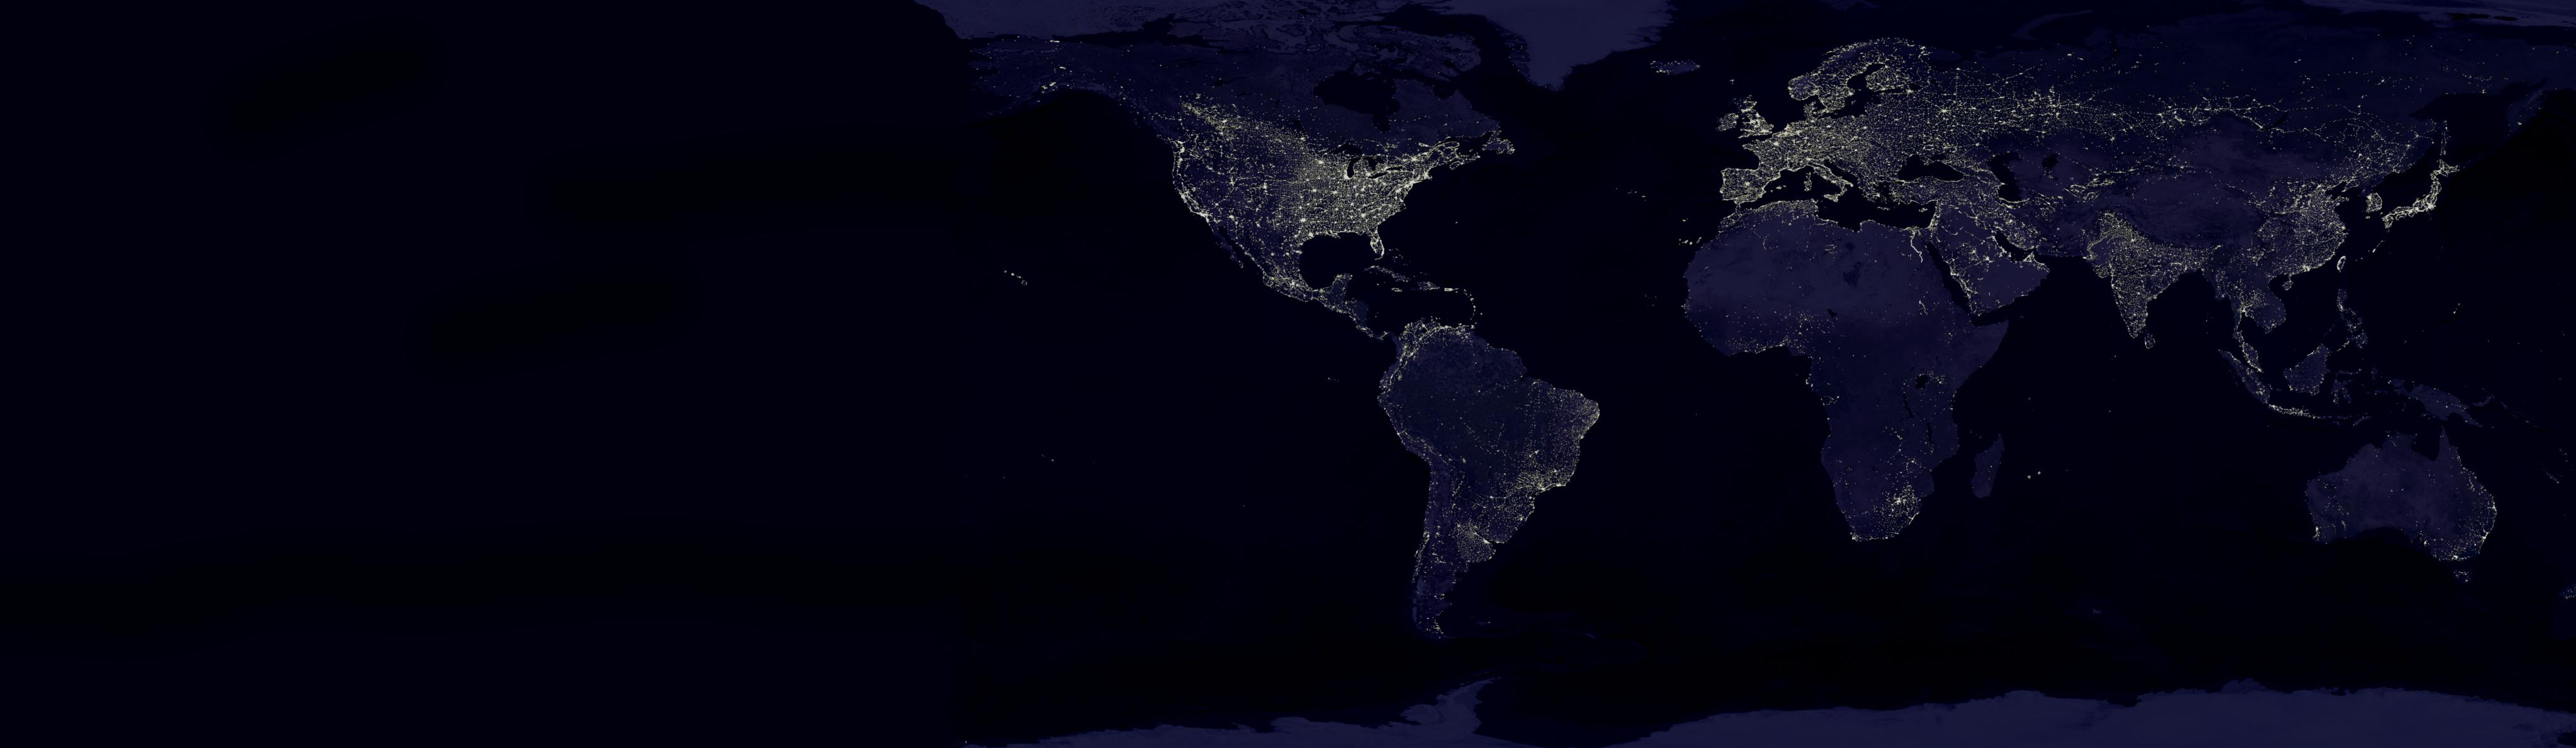 flat earth nasa satellite - photo #19